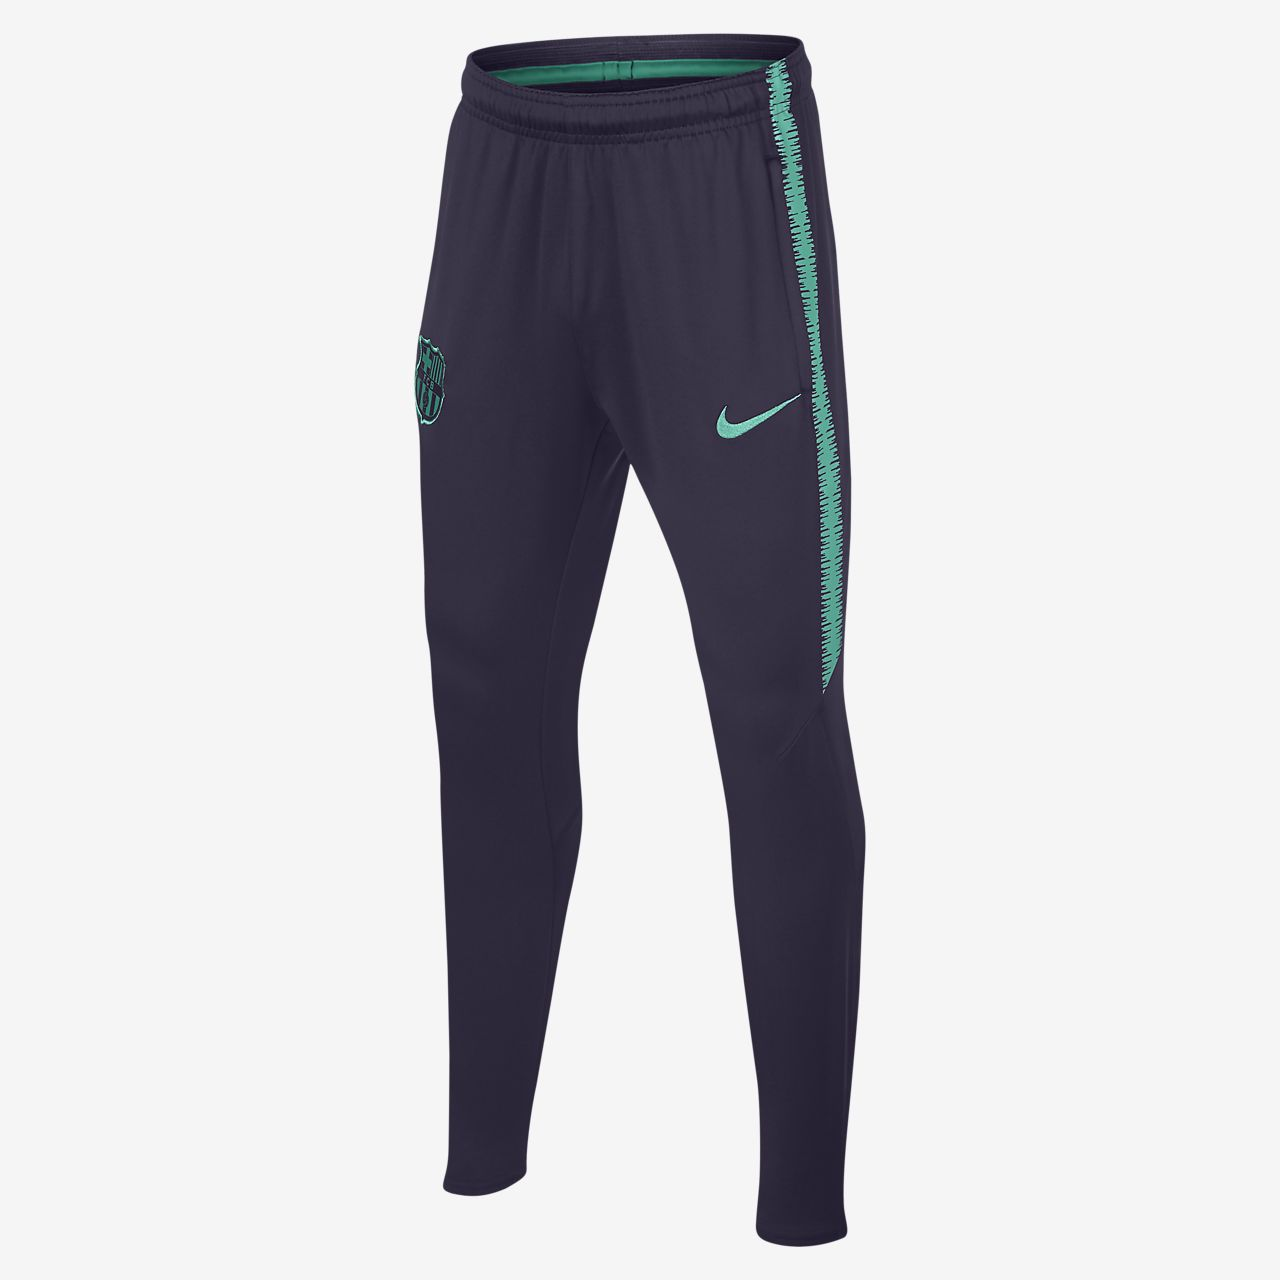 Pantalones de fútbol para niños talla grande FC Barcelona Dri-FIT Squad